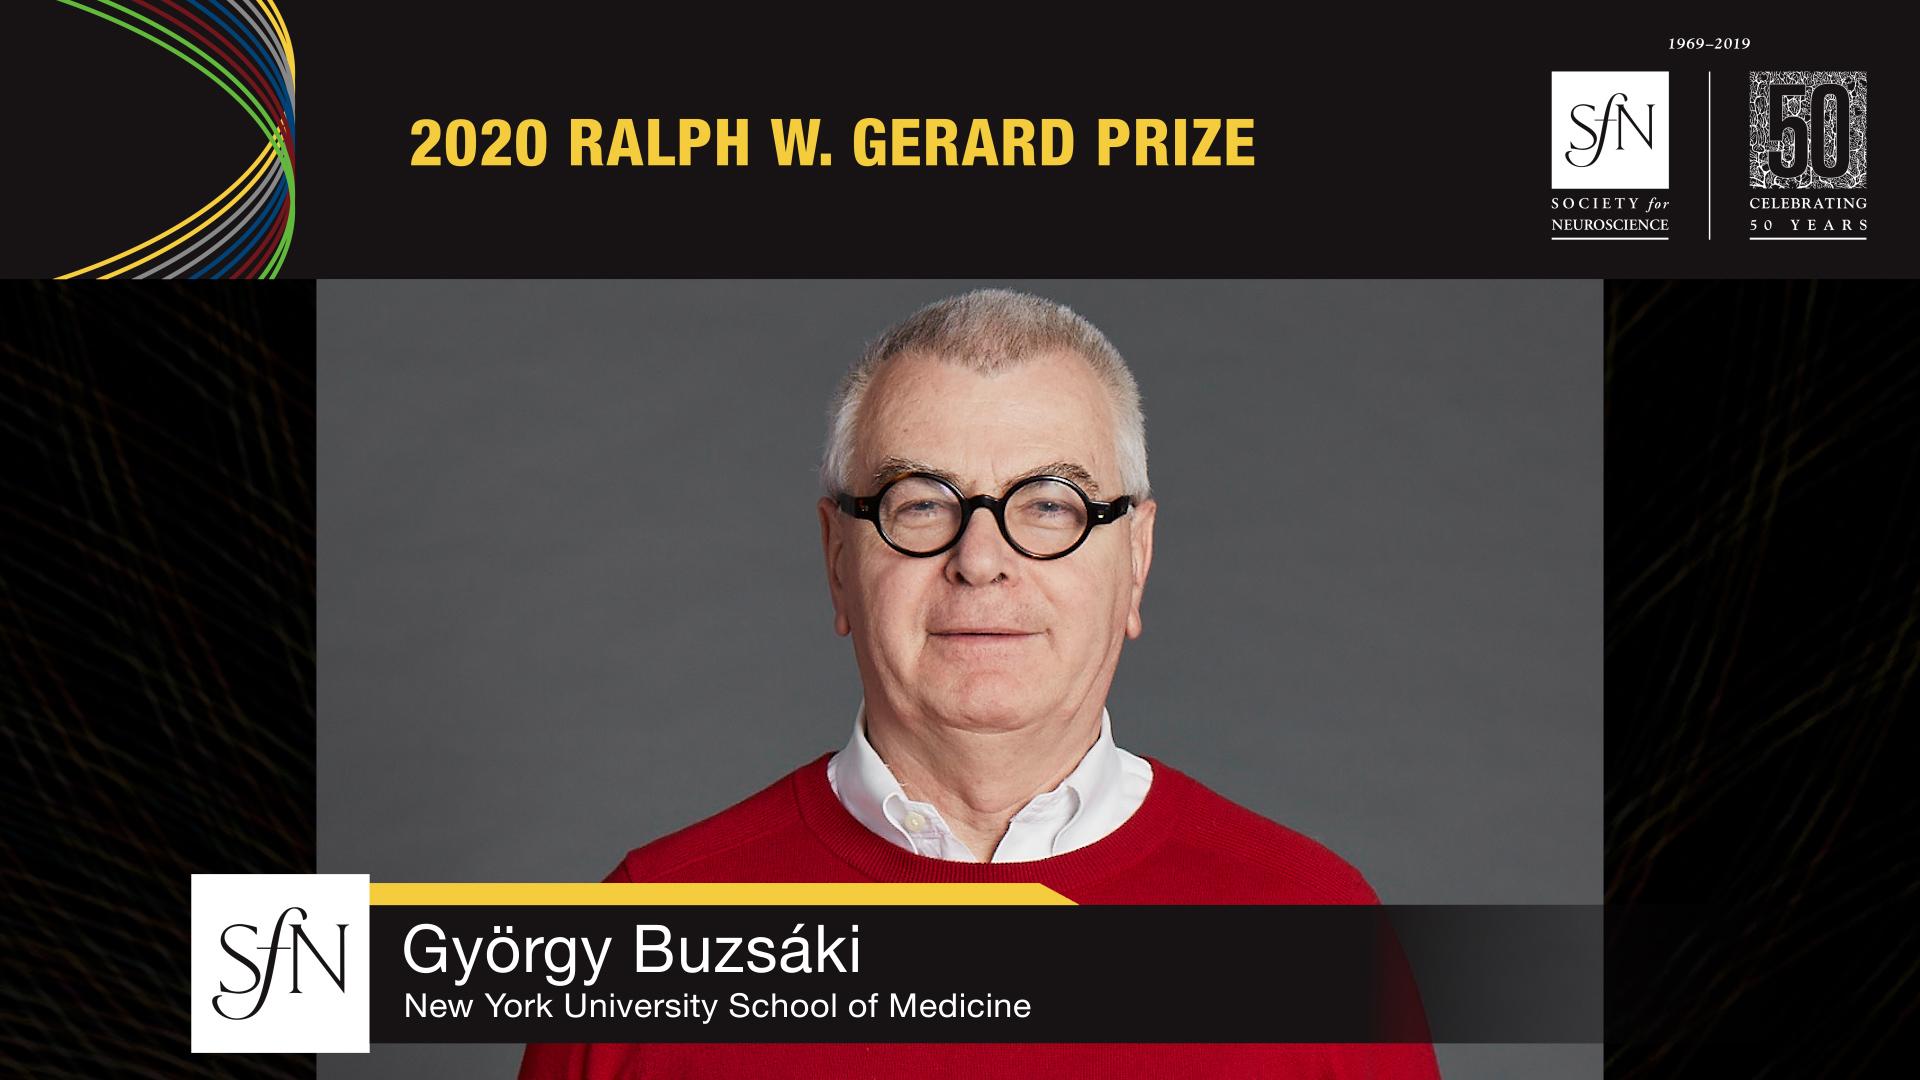 2020 Ralph W. Gerard award winner graphic, image of Gyorgy Buzsaki New York University School of Medicine